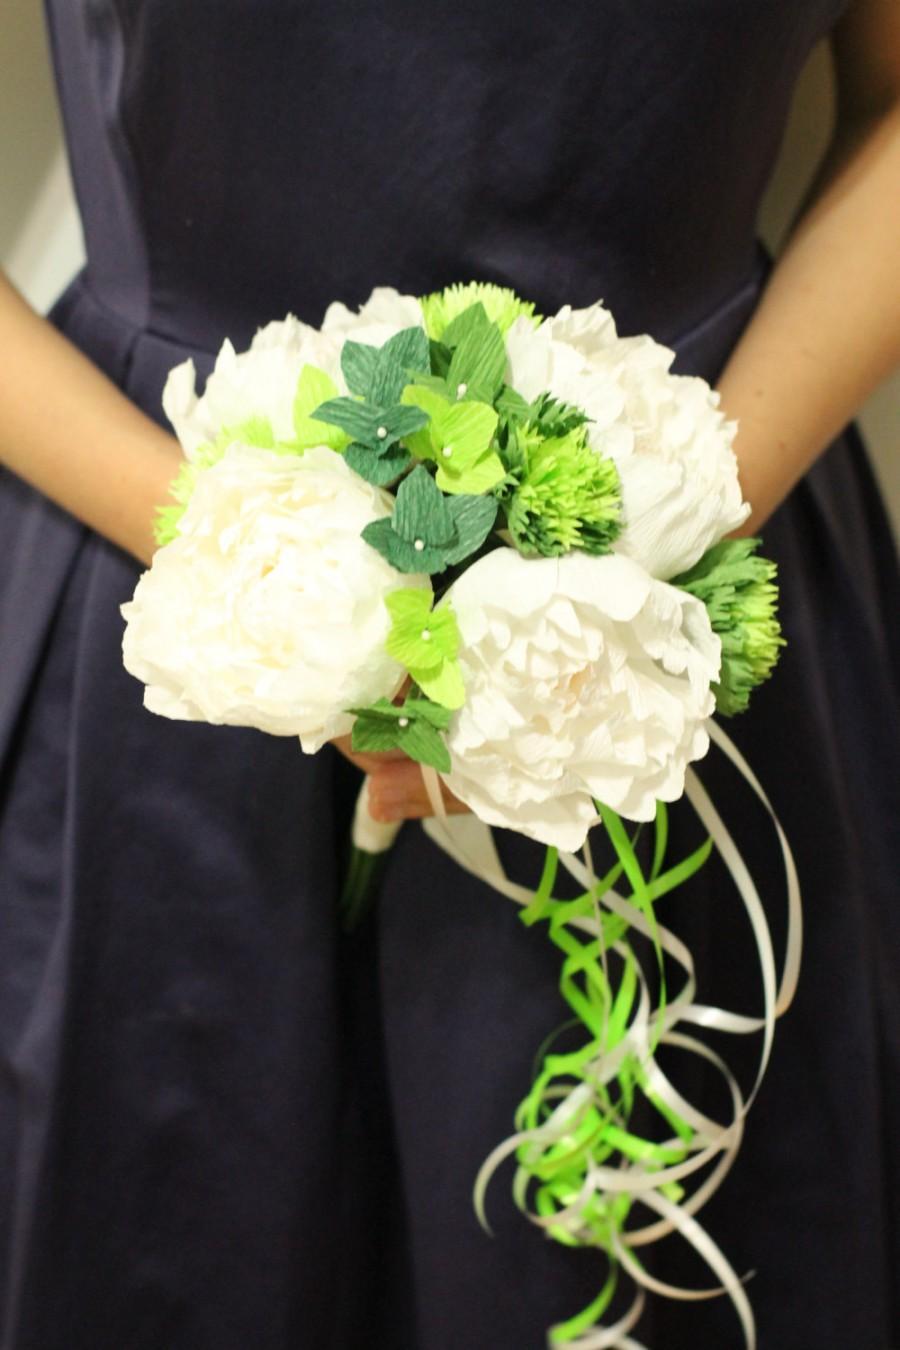 1 peonies bouquet bridesmaid bouquet bridal bouquet crepe paper 1 peonies bouquet bridesmaid bouquet bridal bouquet crepe paper flowers wedding bouquet paper peonies wedding decoration izmirmasajfo